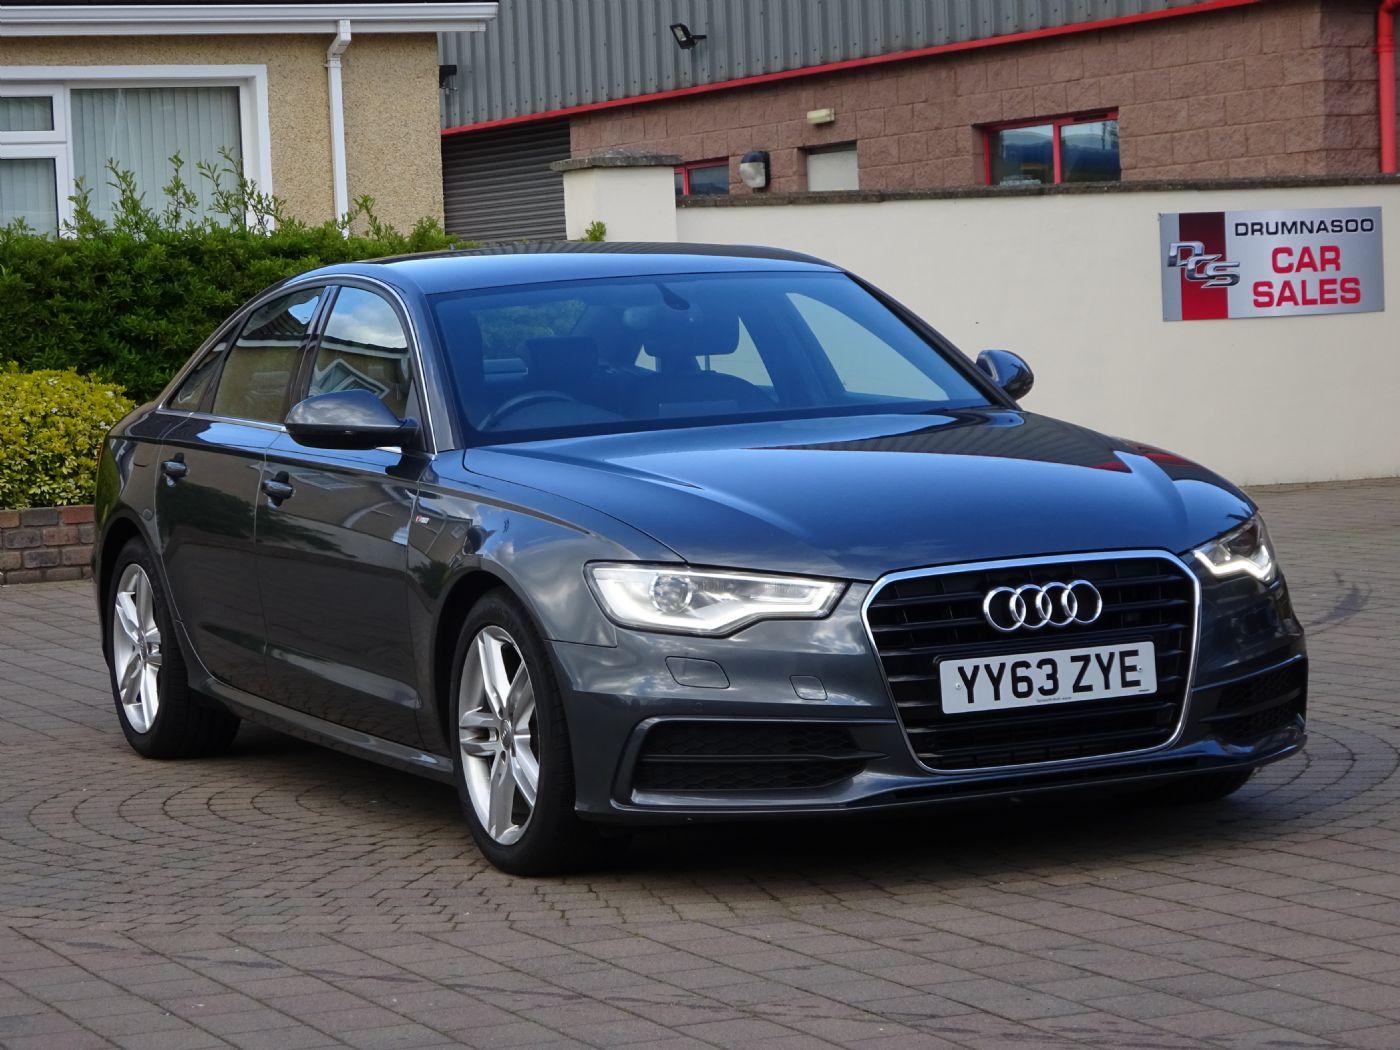 Audi A6 S LINE TDI Auto, Leather, Sat nav